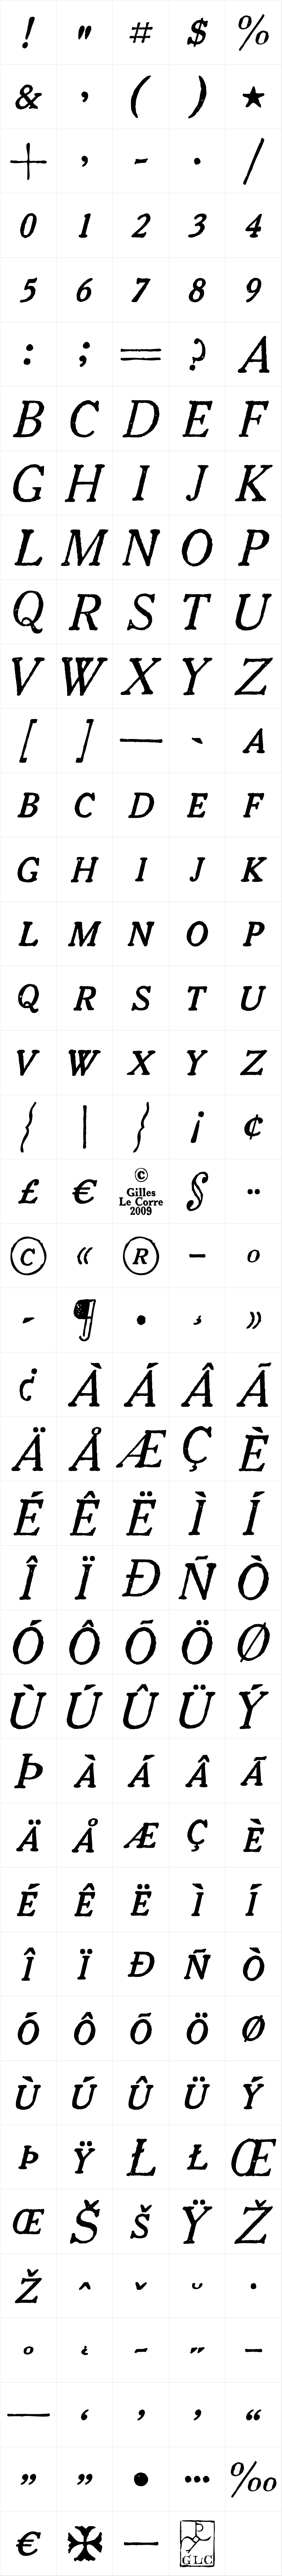 1906 French News Caps Italic